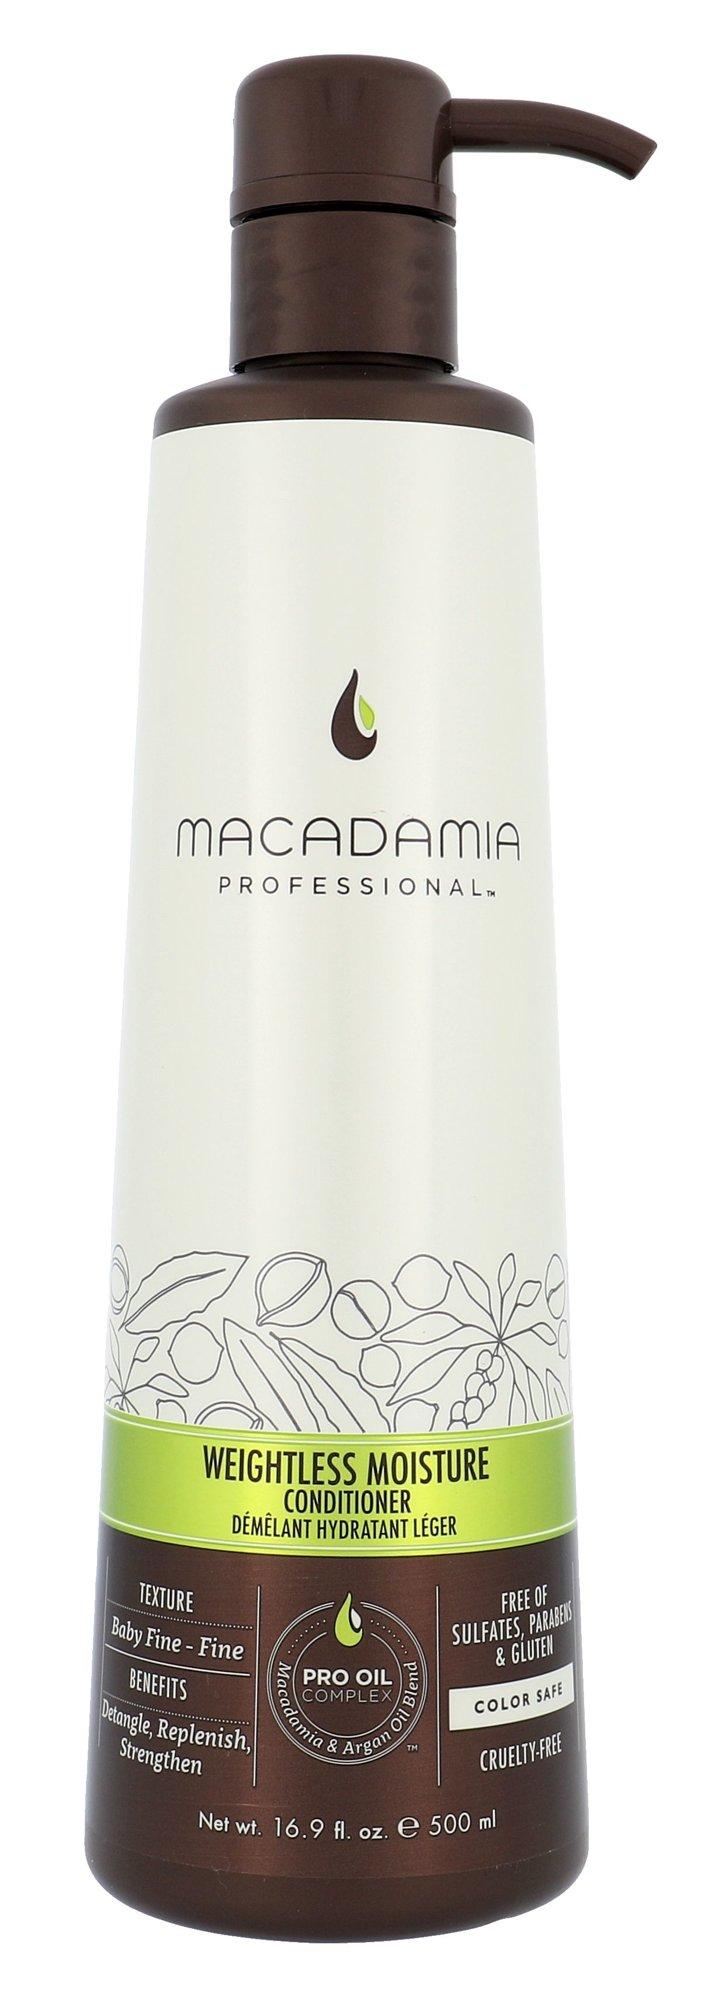 Macadamia Professional Weightless Moisture Cosmetic 500ml